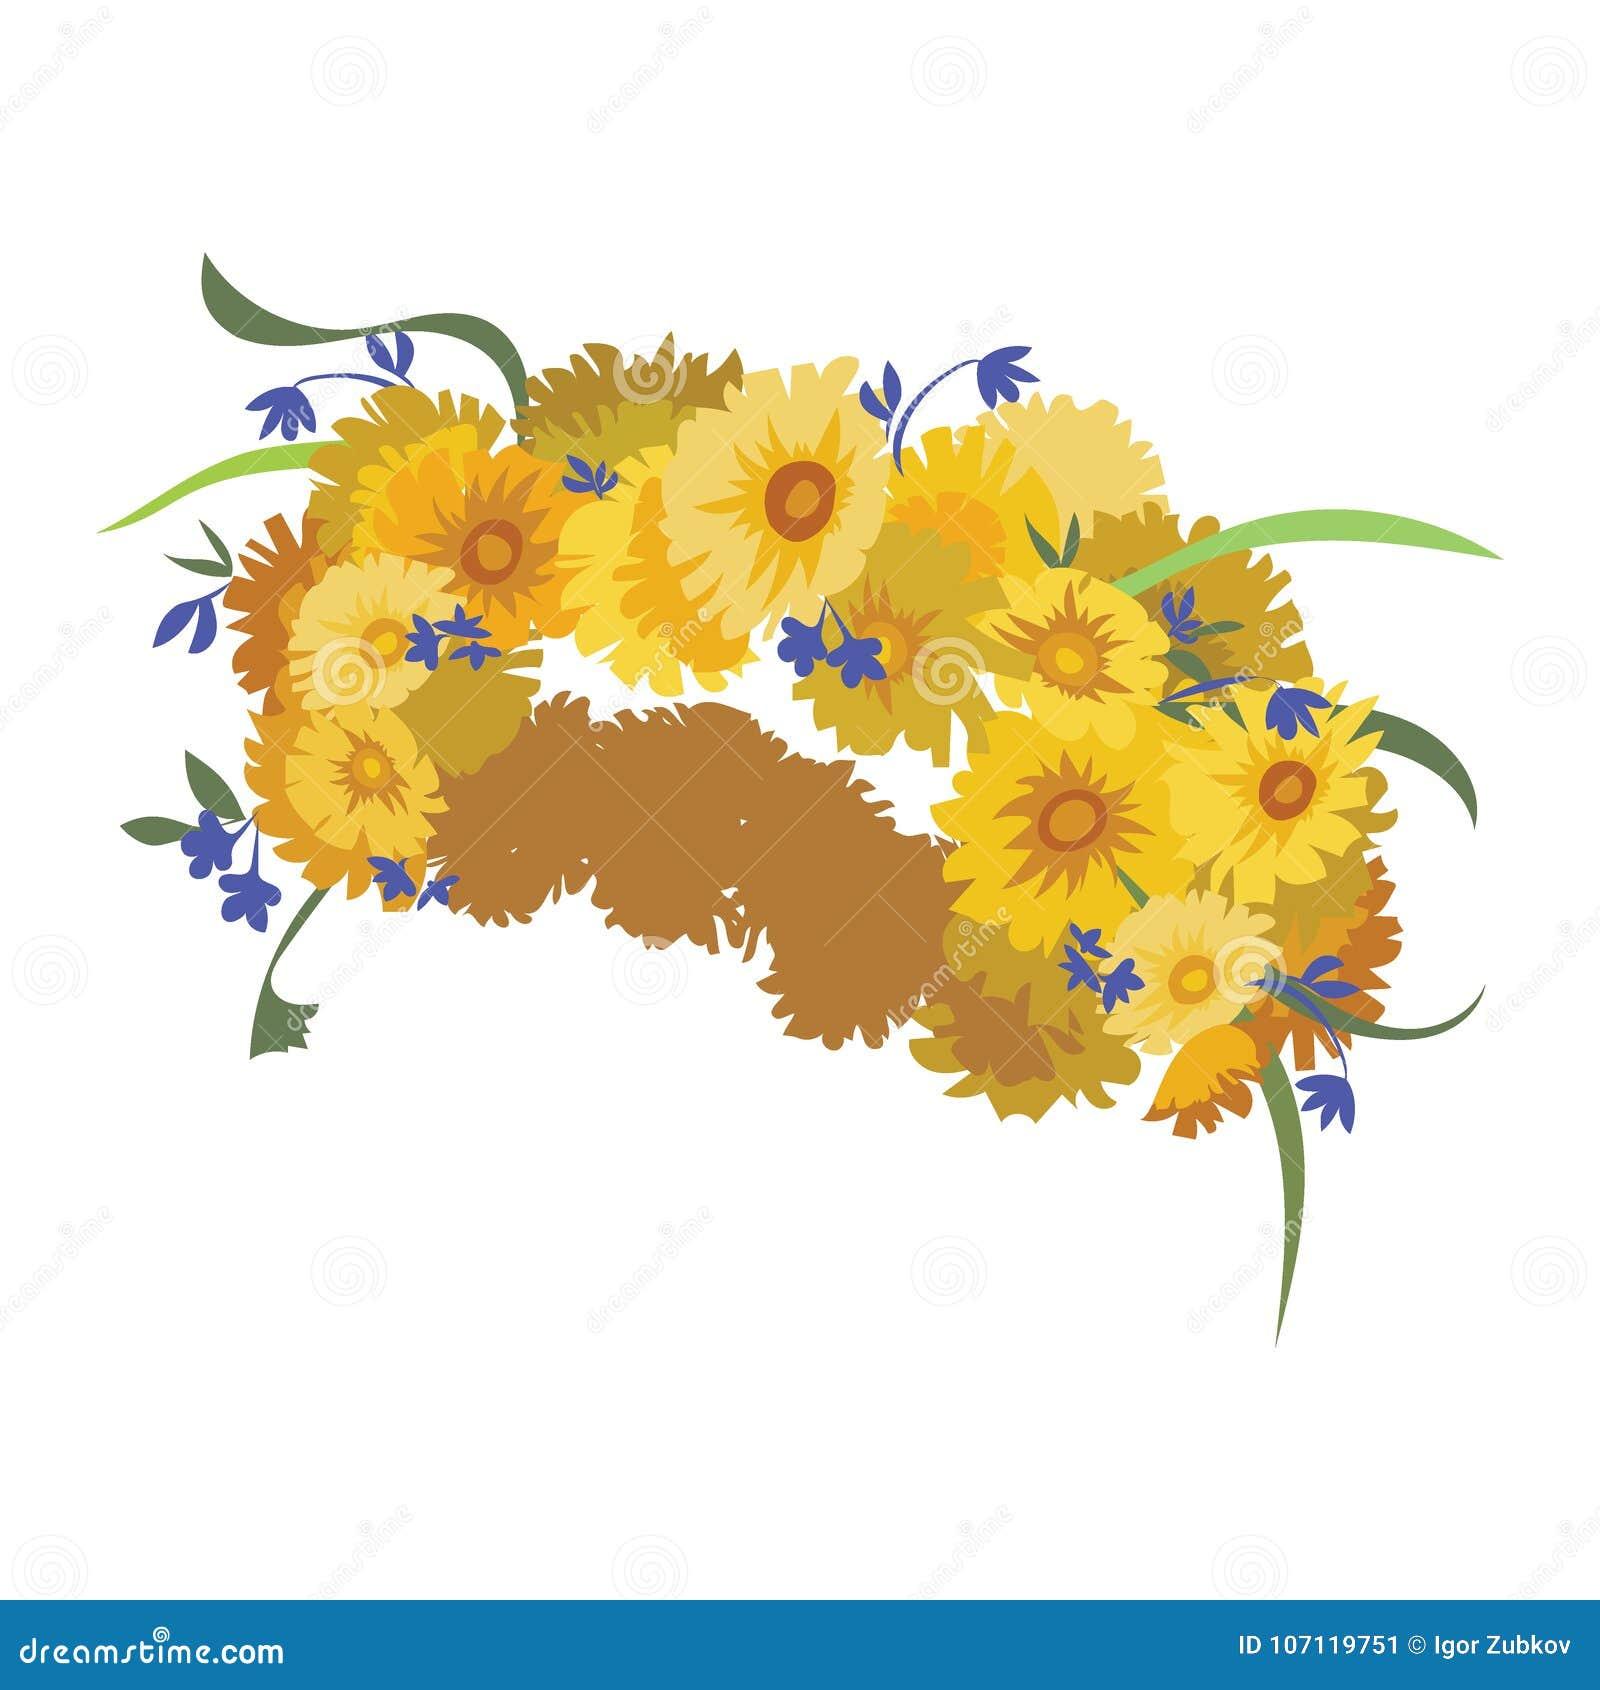 Wreath Of Dandelions Spring Wreath Of Flowers Headpiece Stock